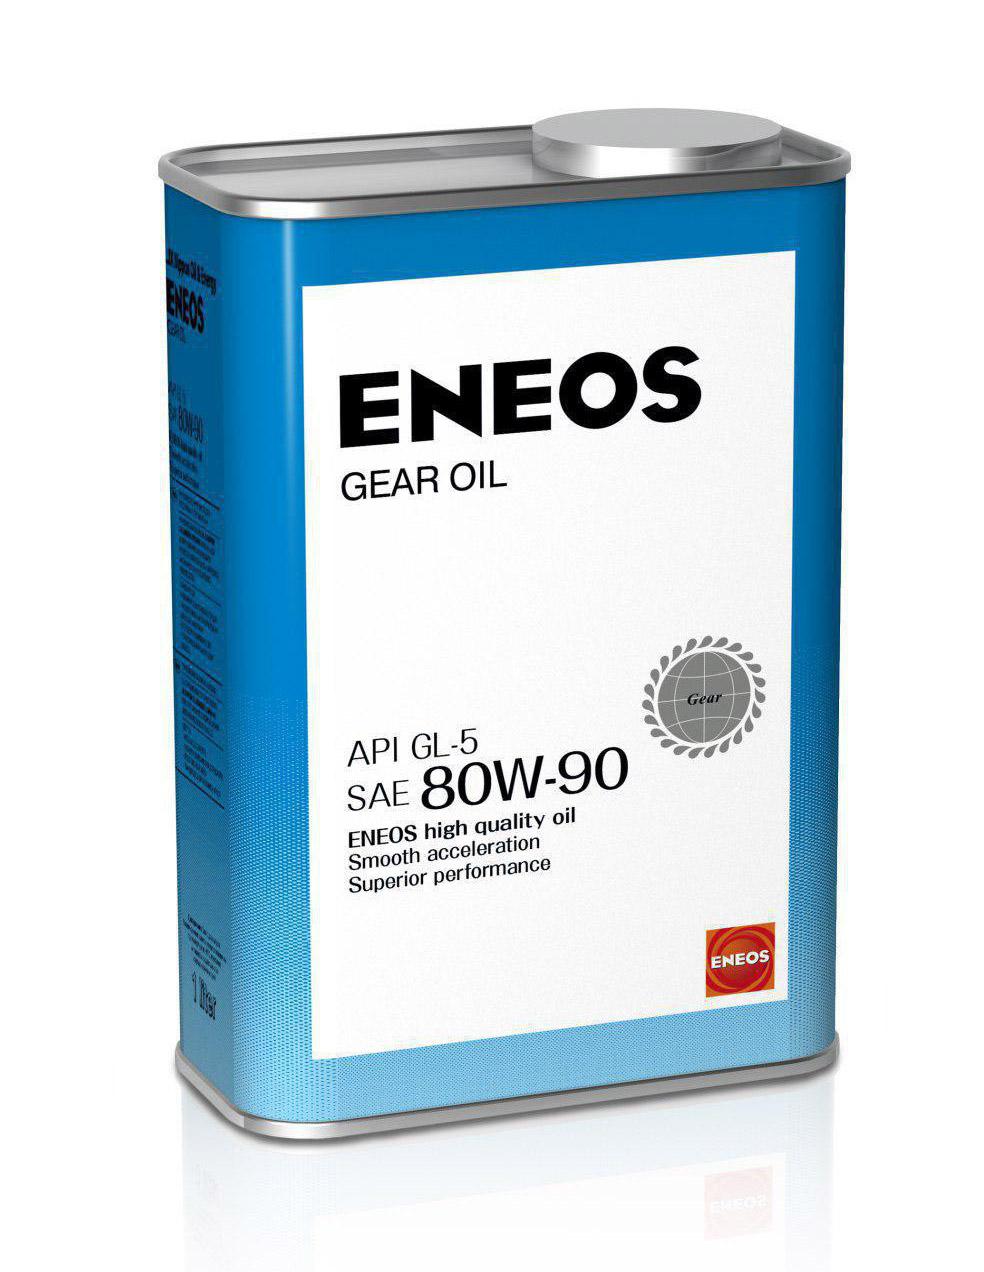 ЕNEOS GEAR, 75w-90, GL-4, трансмиссионное масло, полусинтетика, 4л, Япония